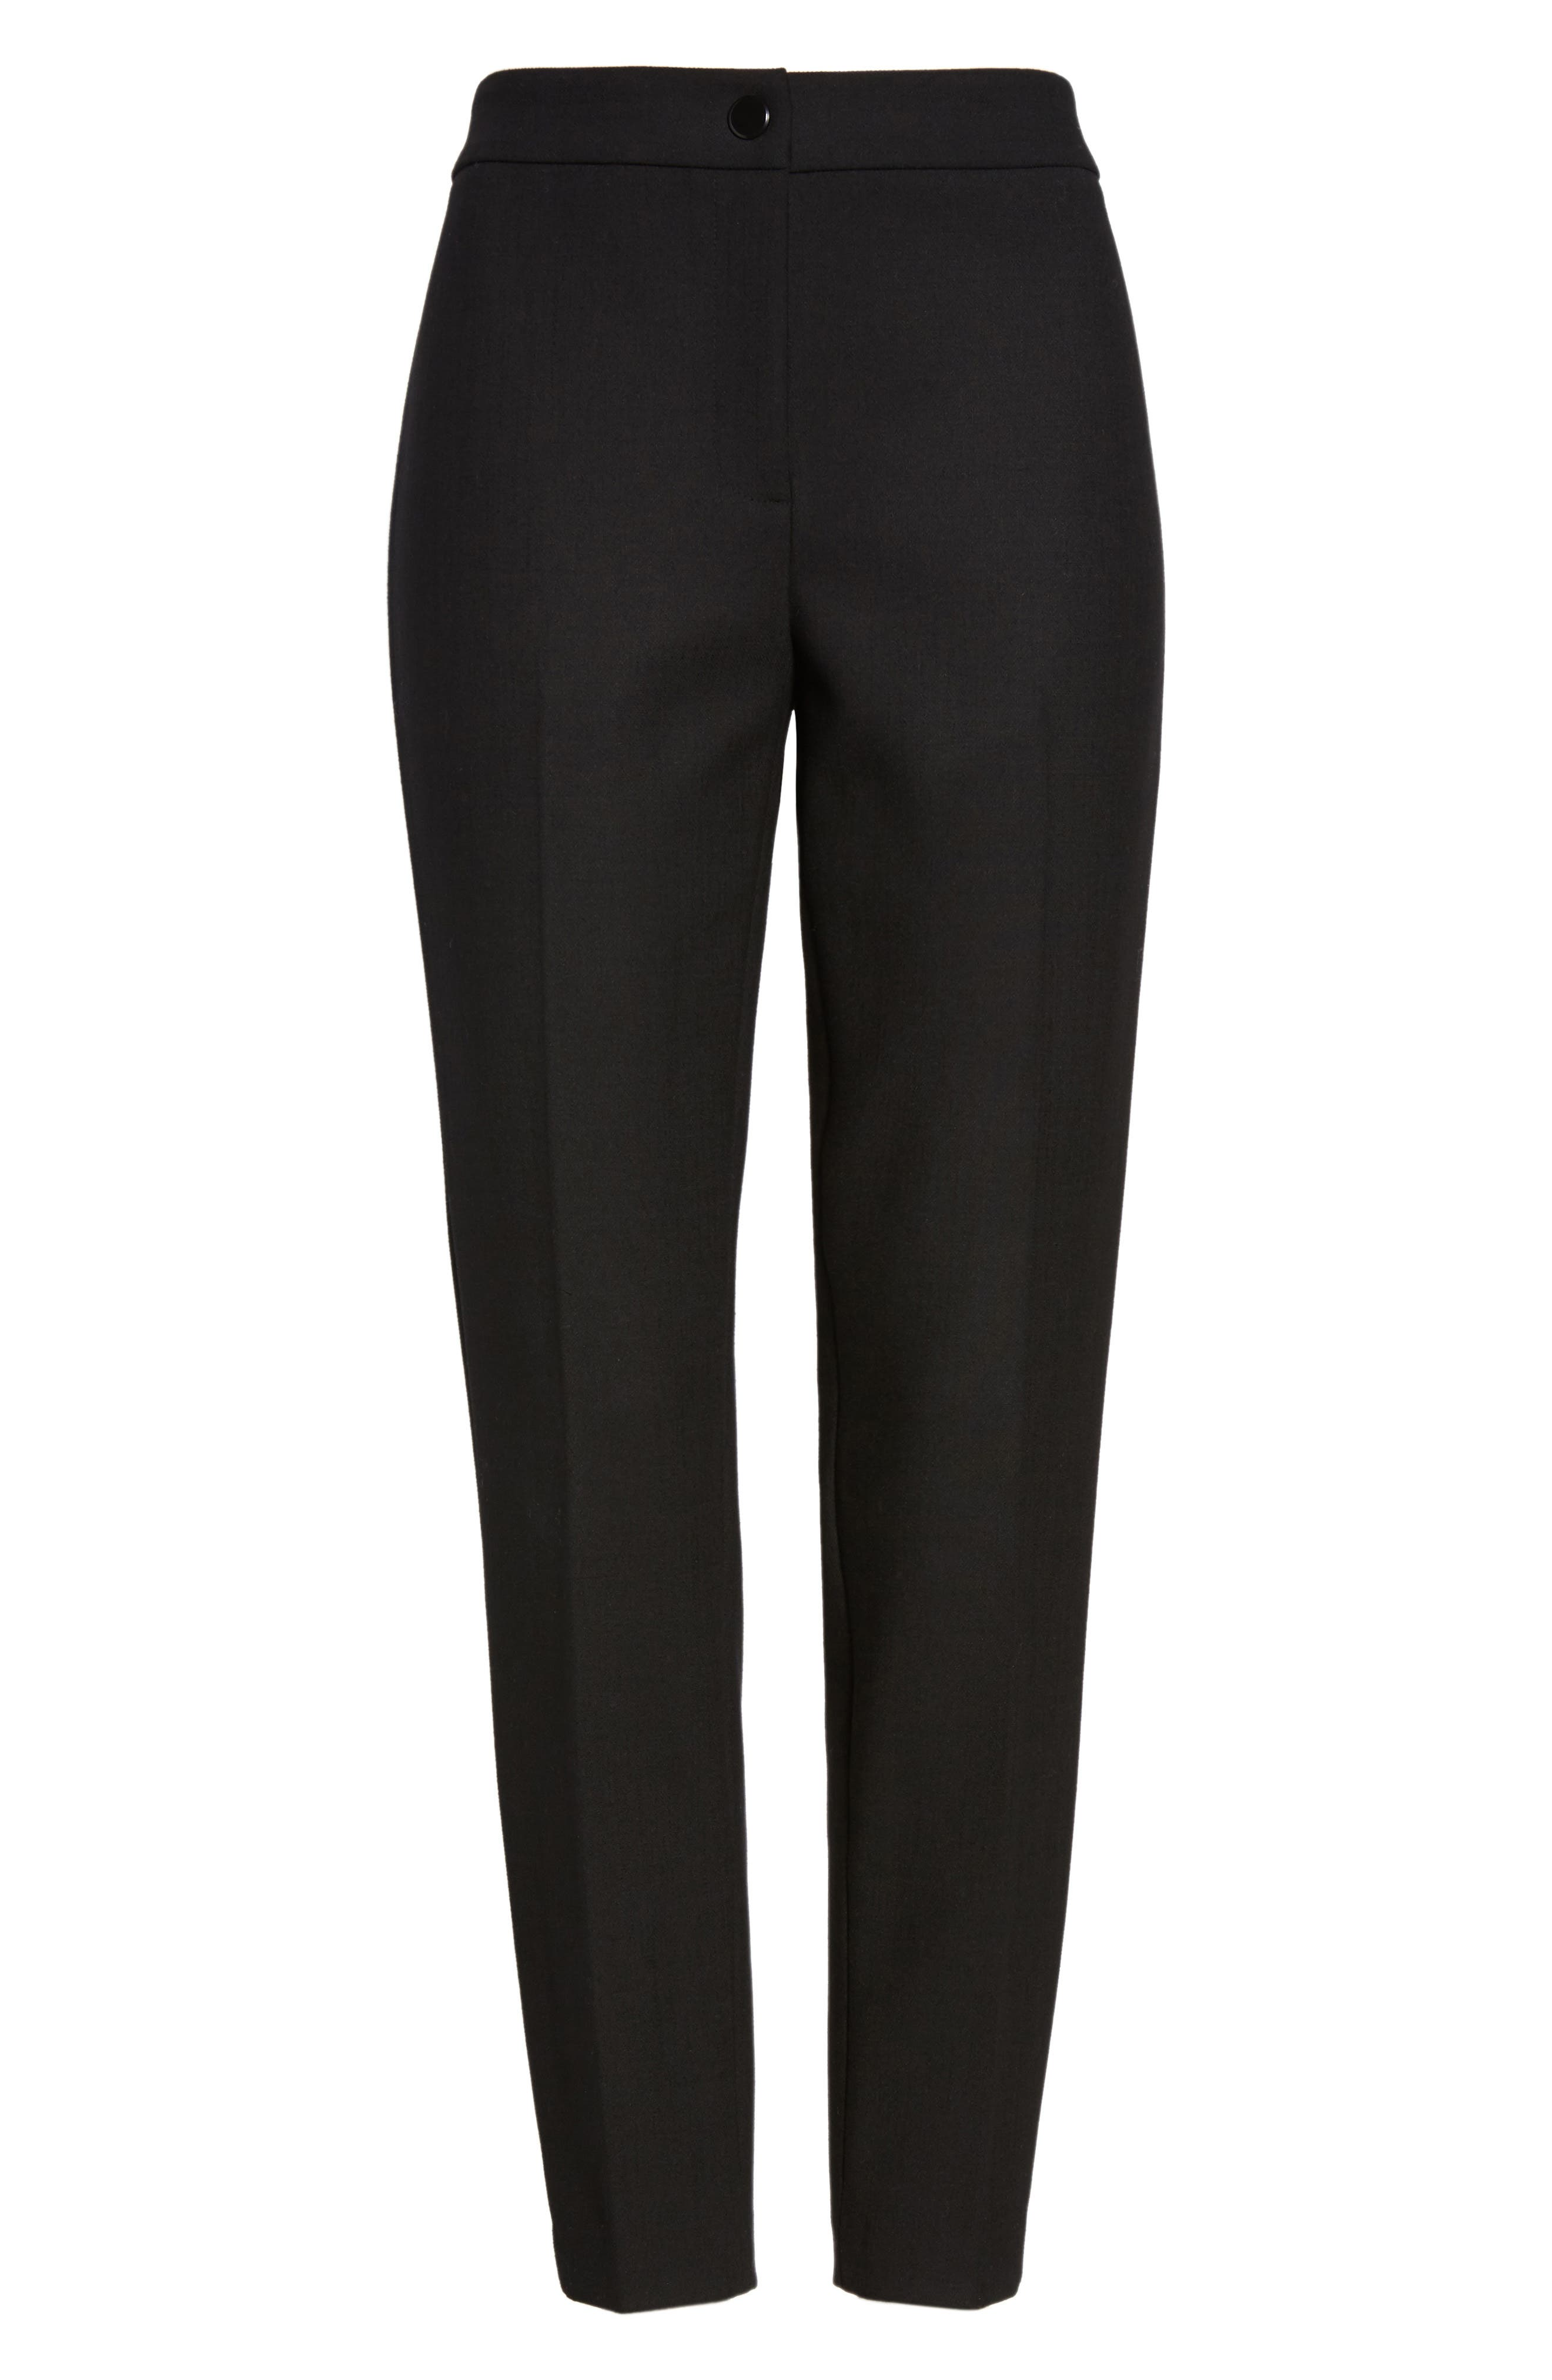 Removable Stirrup Pants,                             Alternate thumbnail 7, color,                             Black